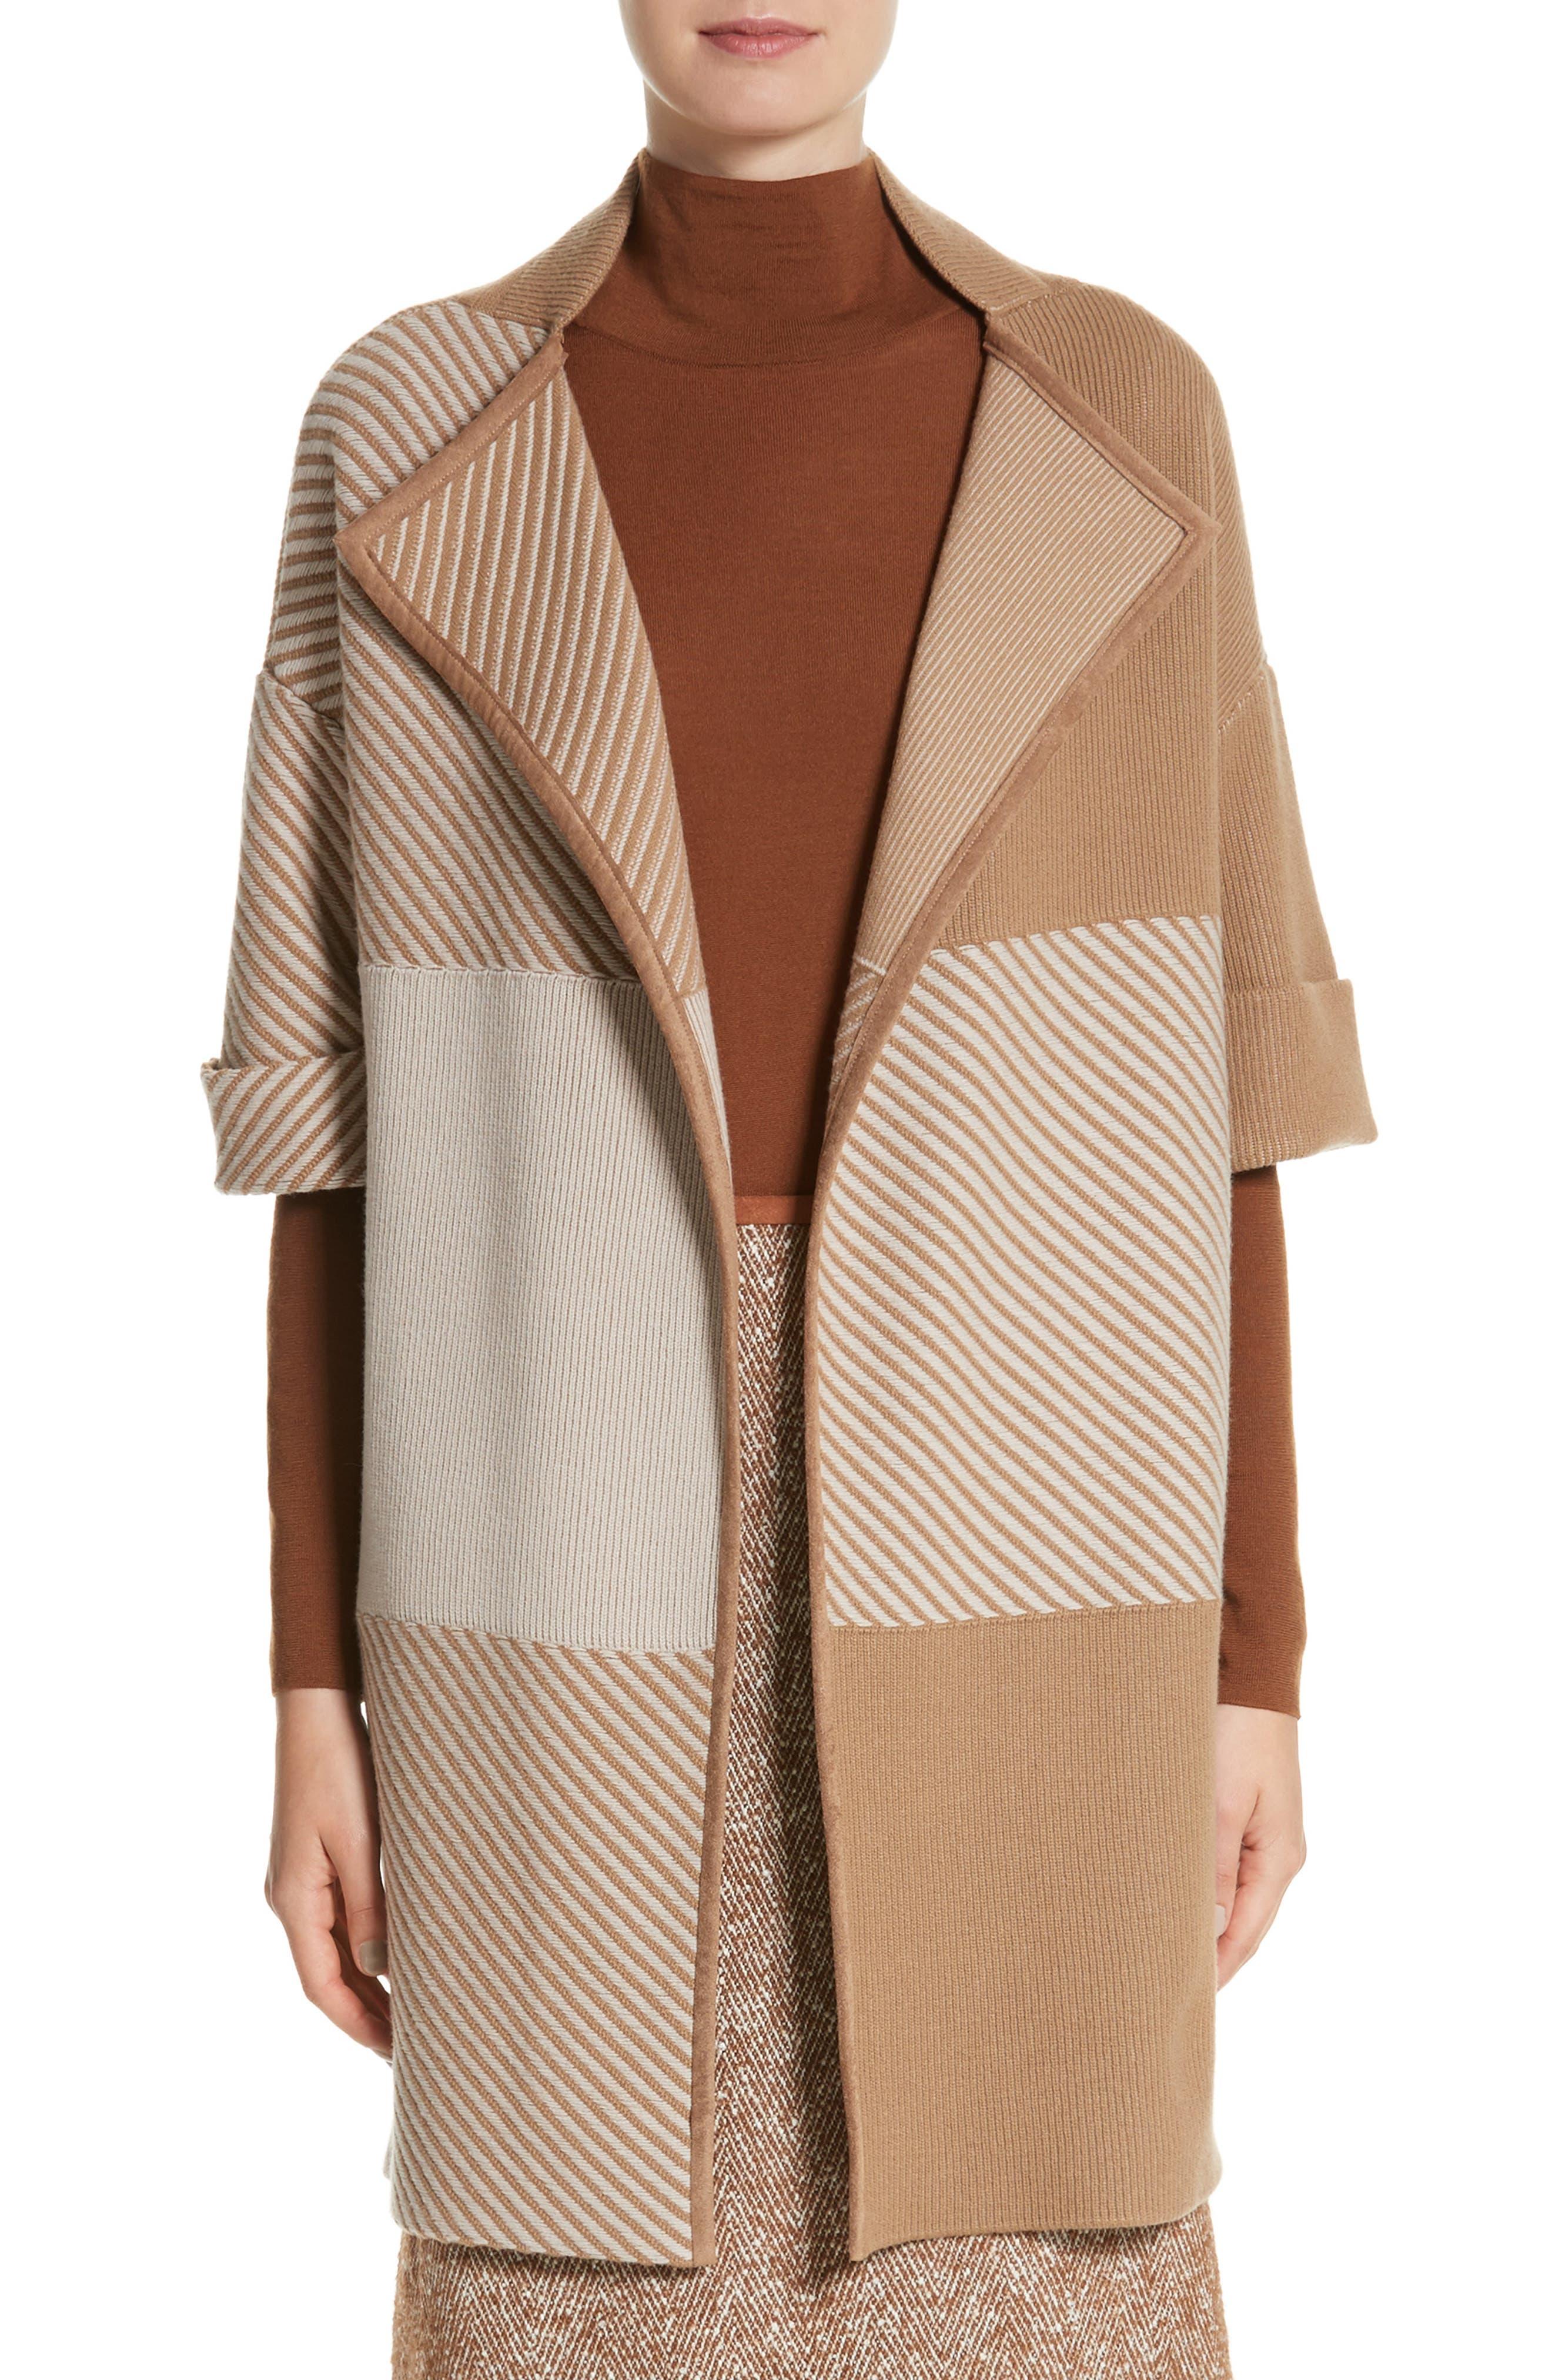 Lafayette 148 New York Flannel Bicolor Jacquard Coat